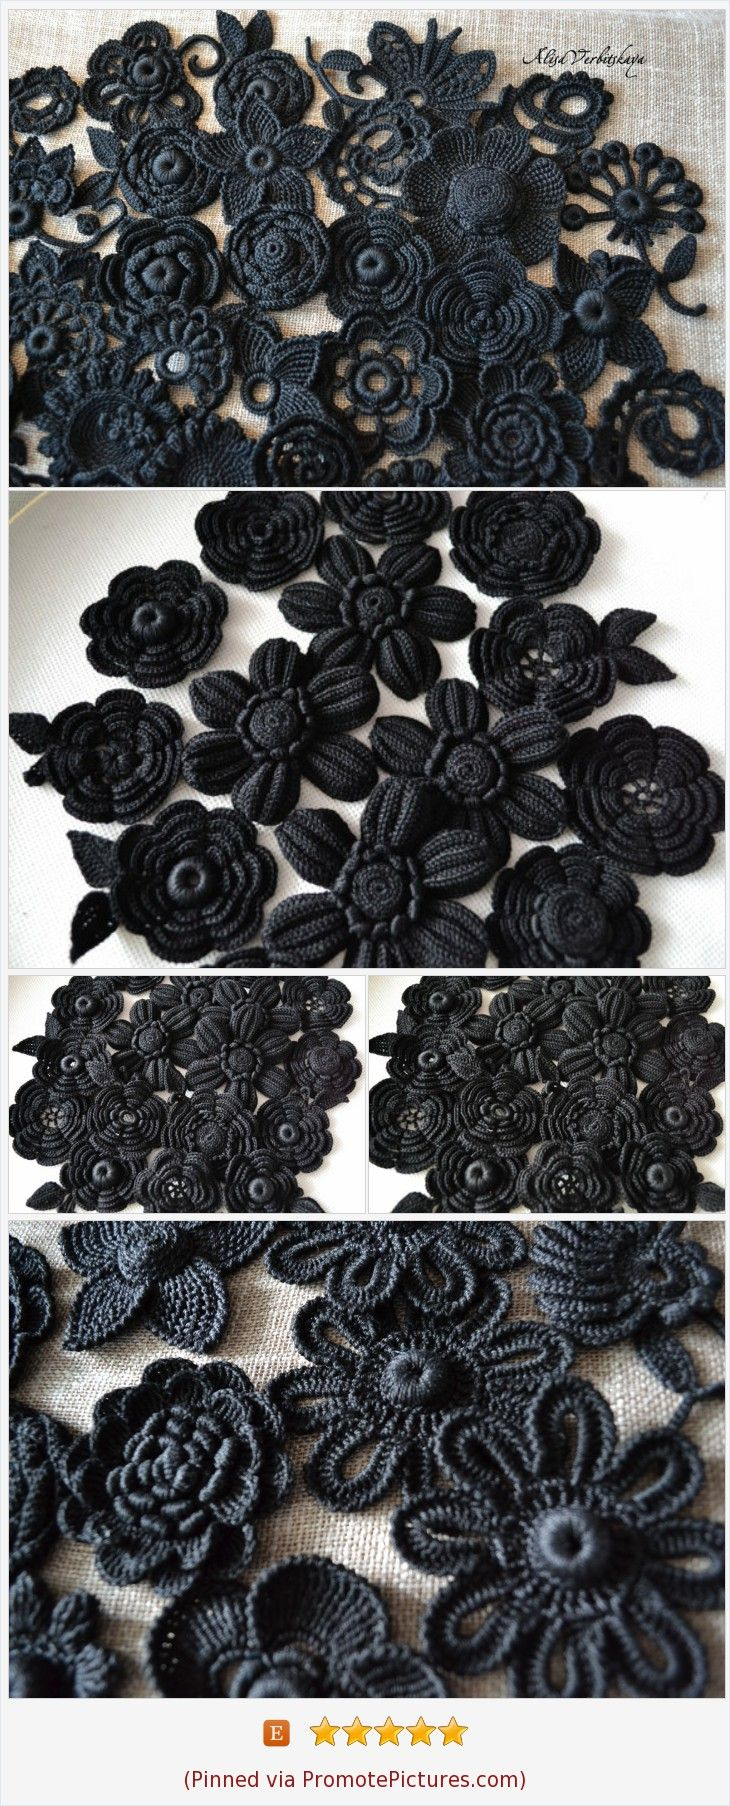 Items similar to Black Rose Crochet flower 10pcs Set flower Black wedding Gothic style flower Goth Witch accessories Dark Victorian Diy kit Irish crochet on Etsy